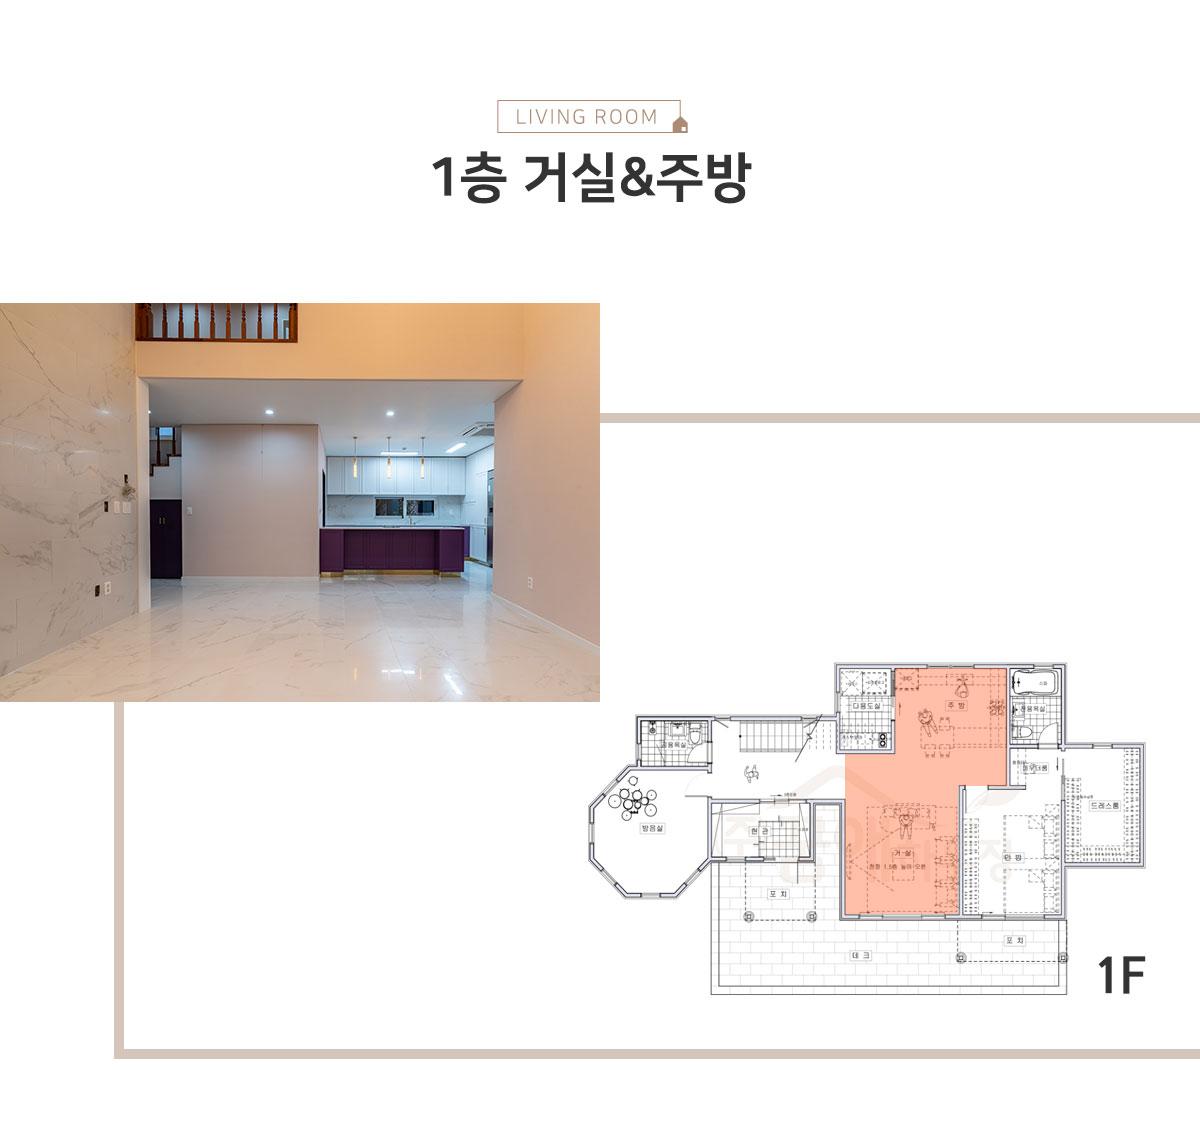 003_living-room_군산_명신전기_01.jpg